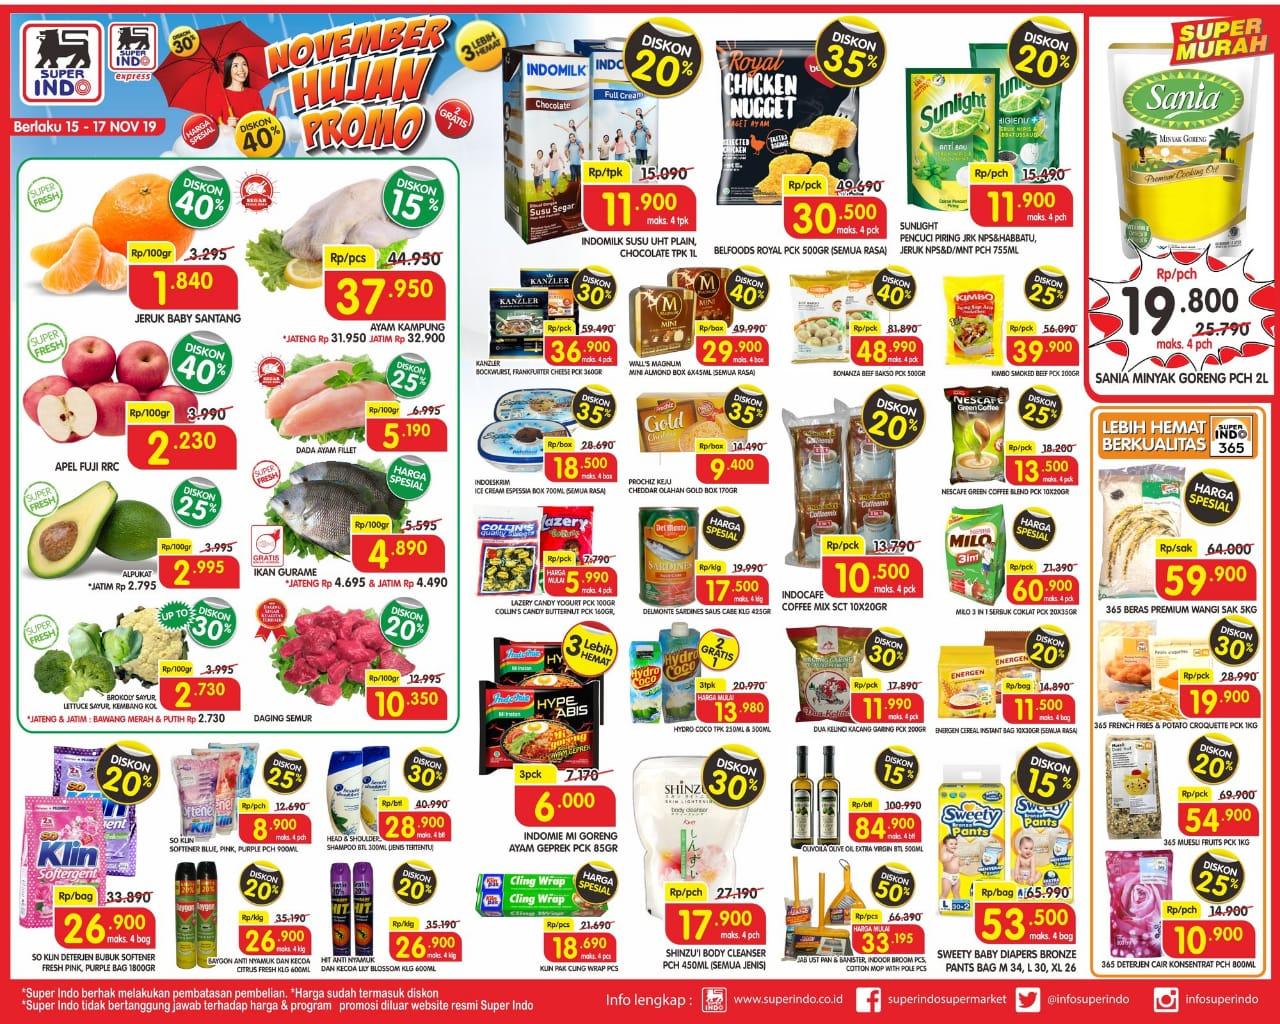 Katalog Promo JSM Superindo Supermarket Periode 15-17 November 2019